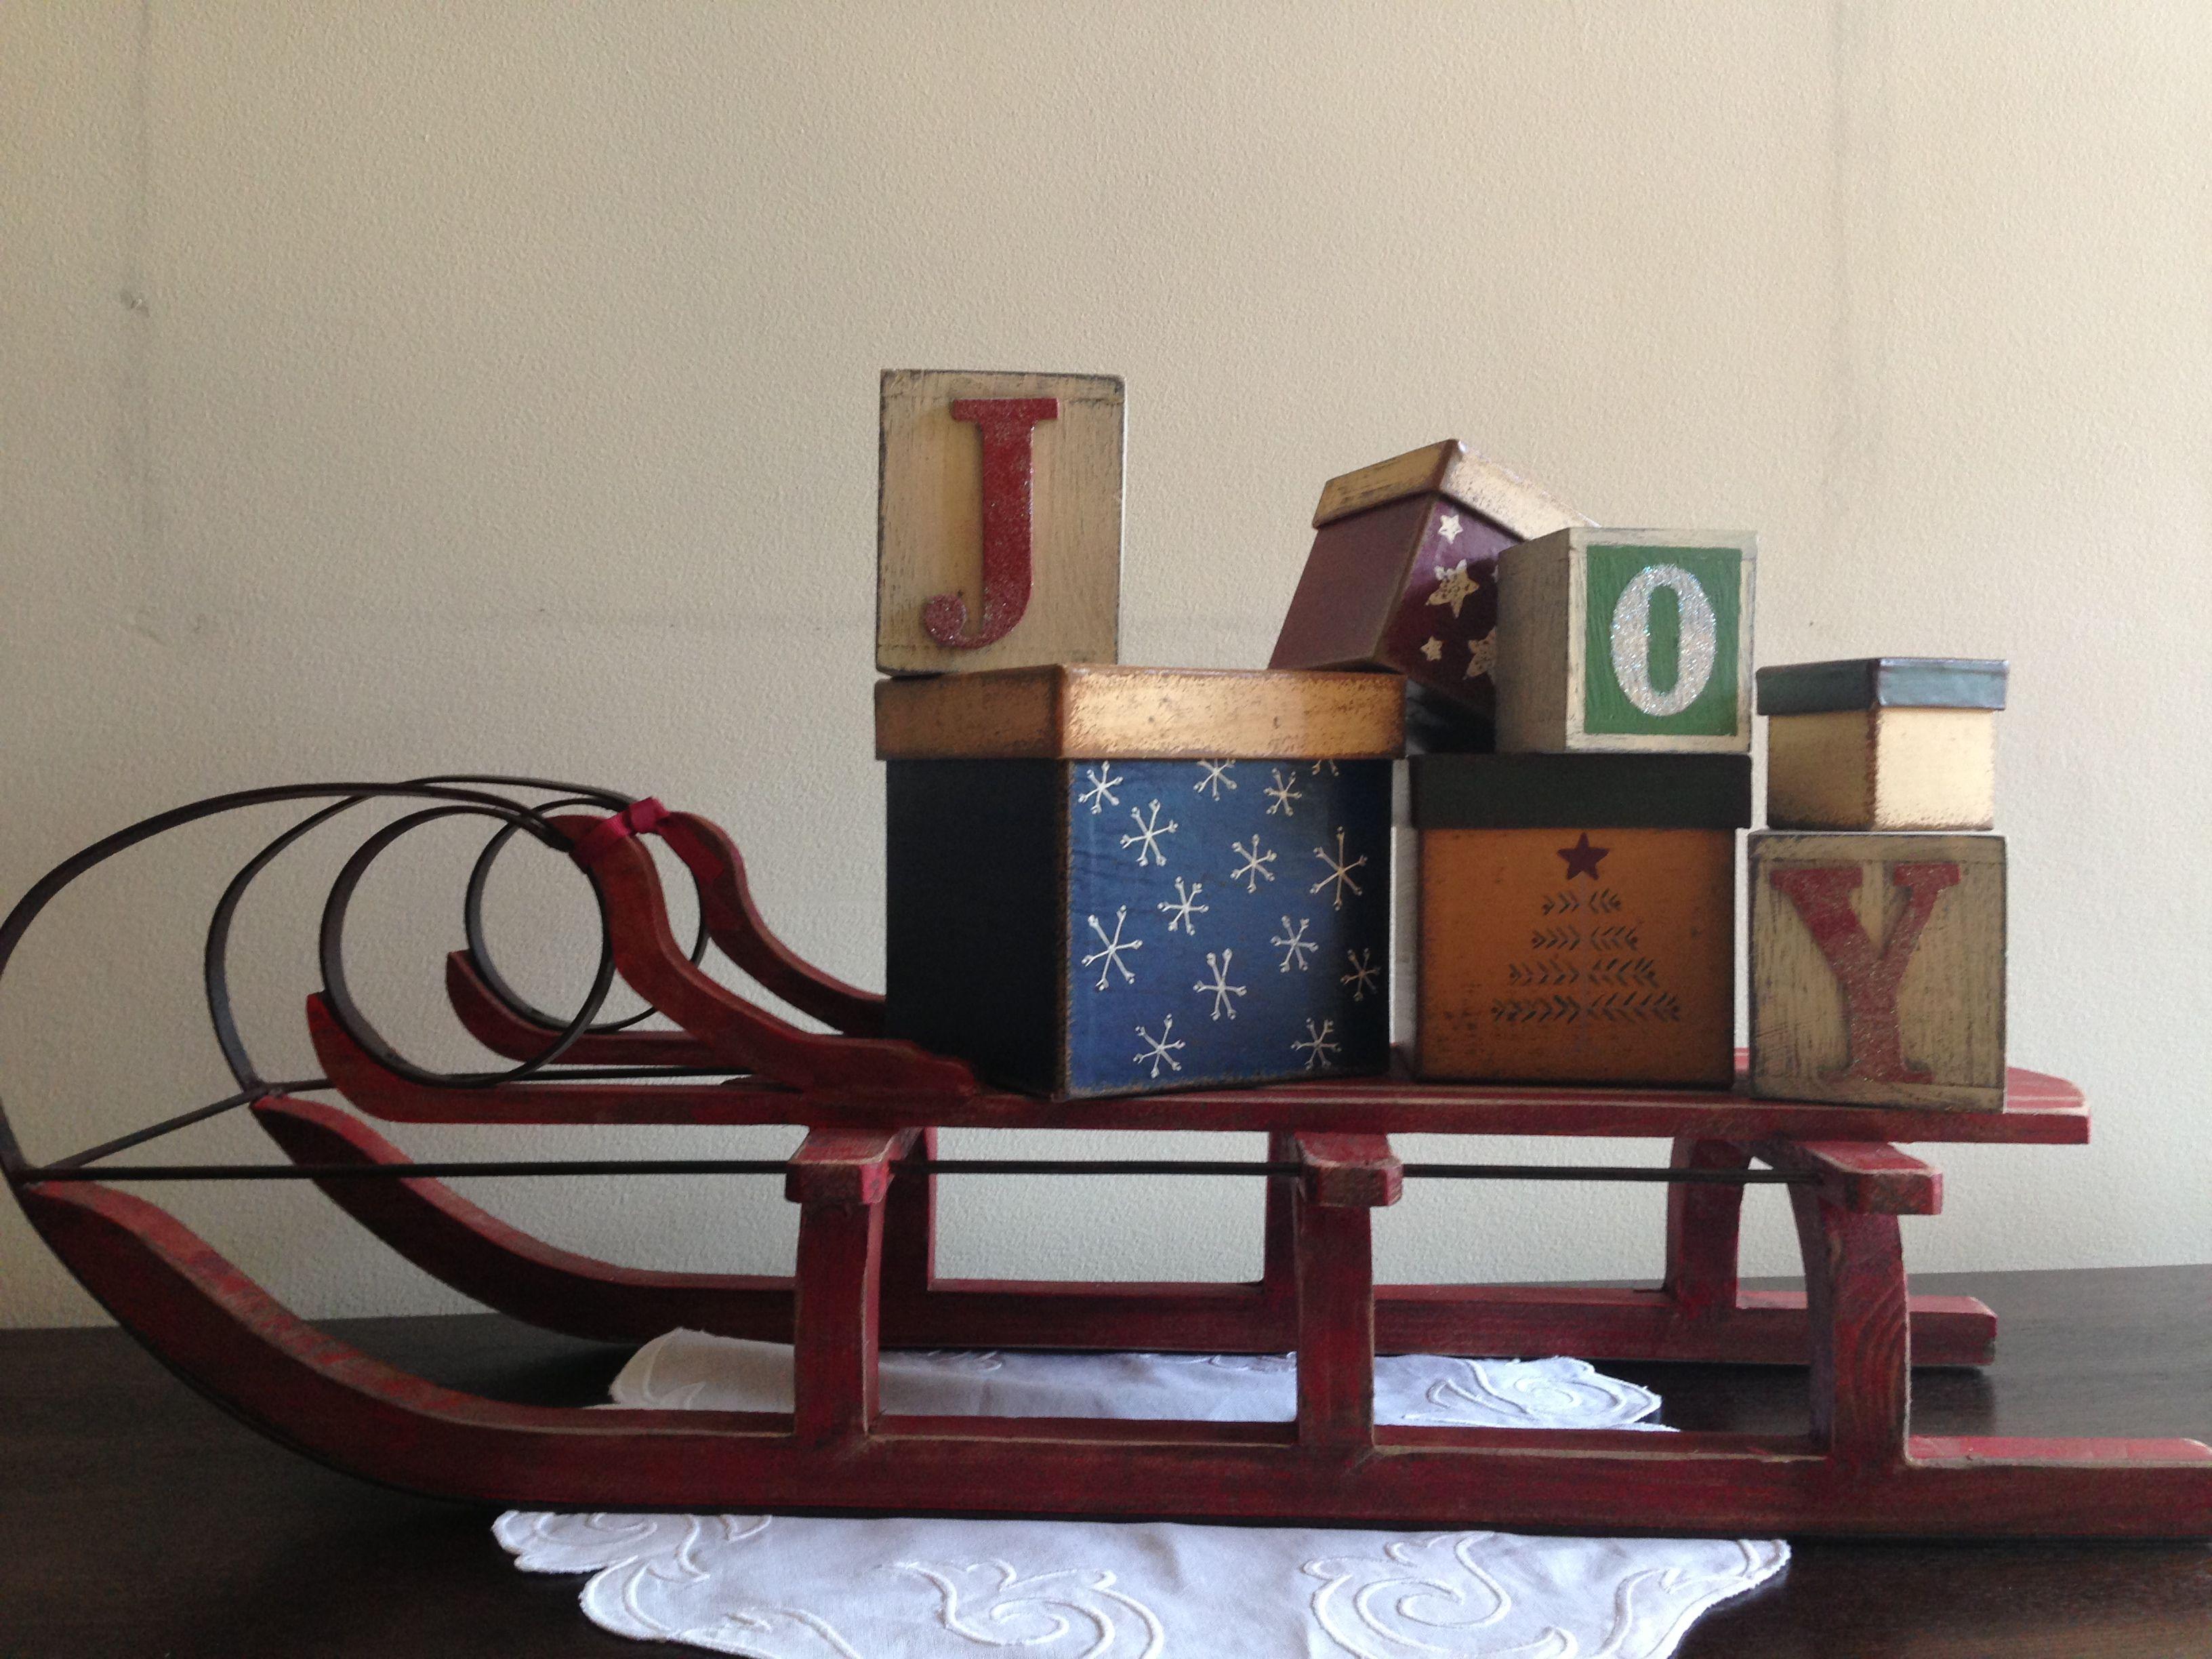 Joy in a little wooden sleigh.